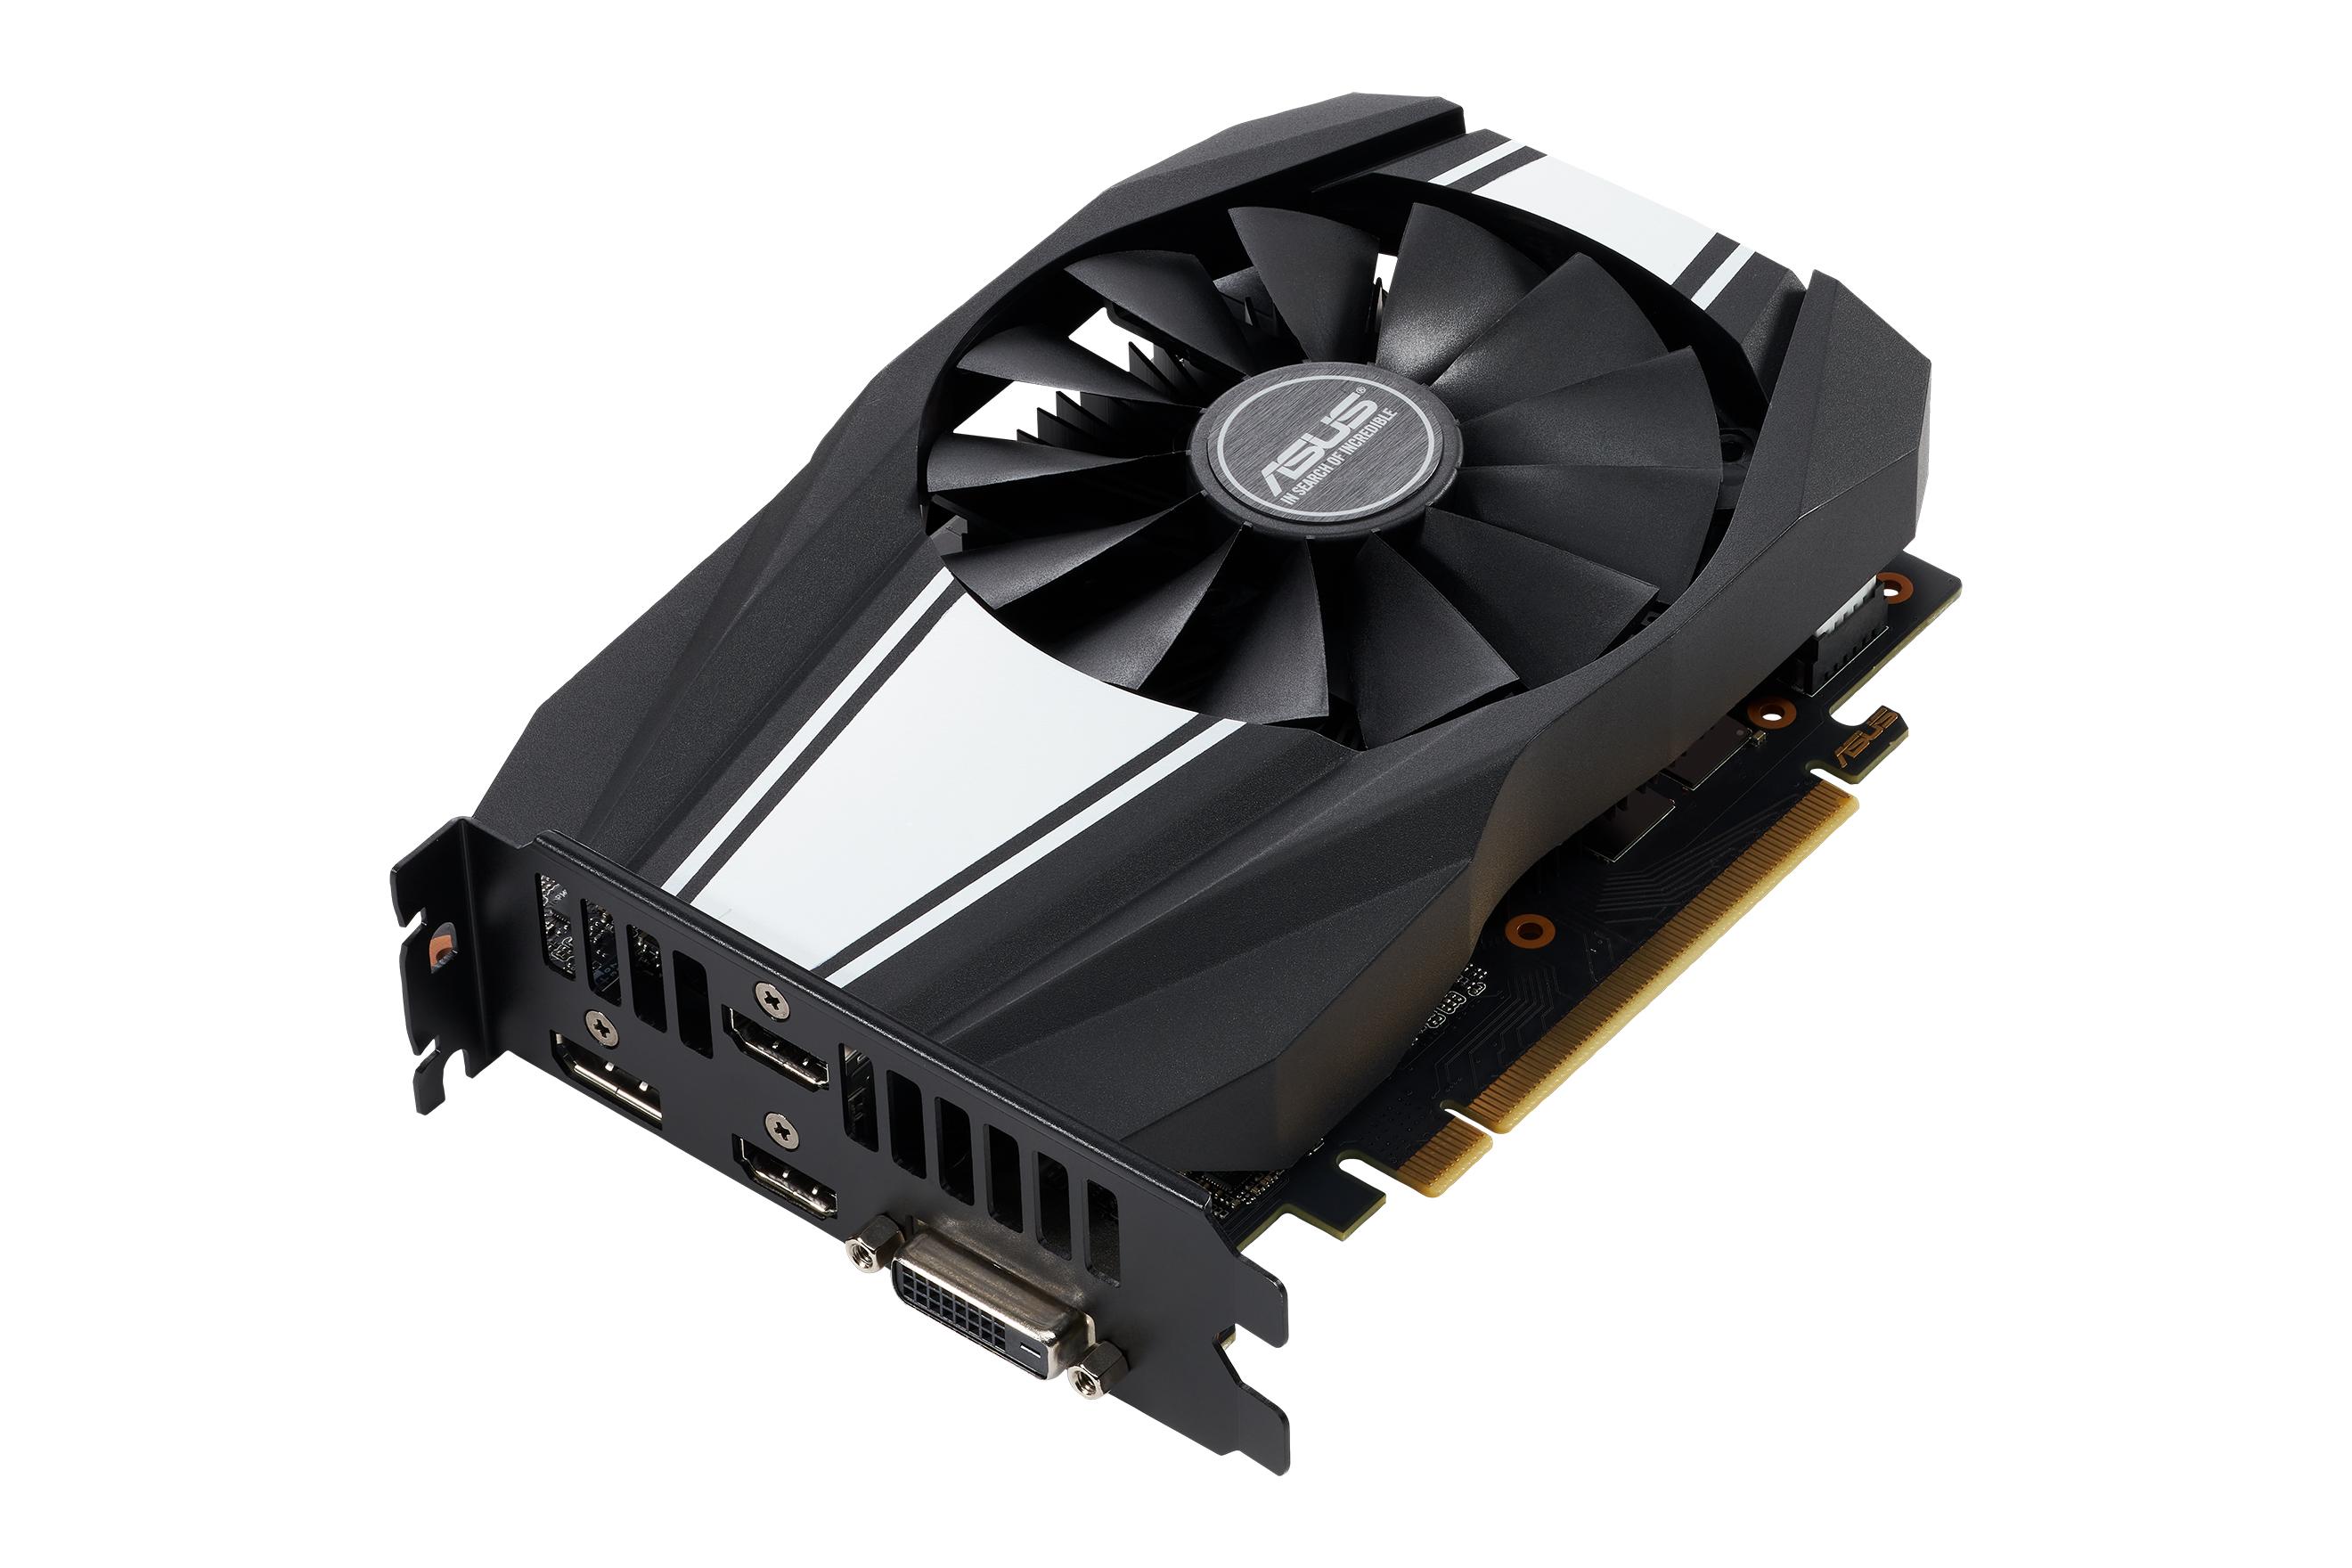 Nvidia выпустила GeForce GTX 1660 Ti, а AMD снизила цену на RX Vega 56